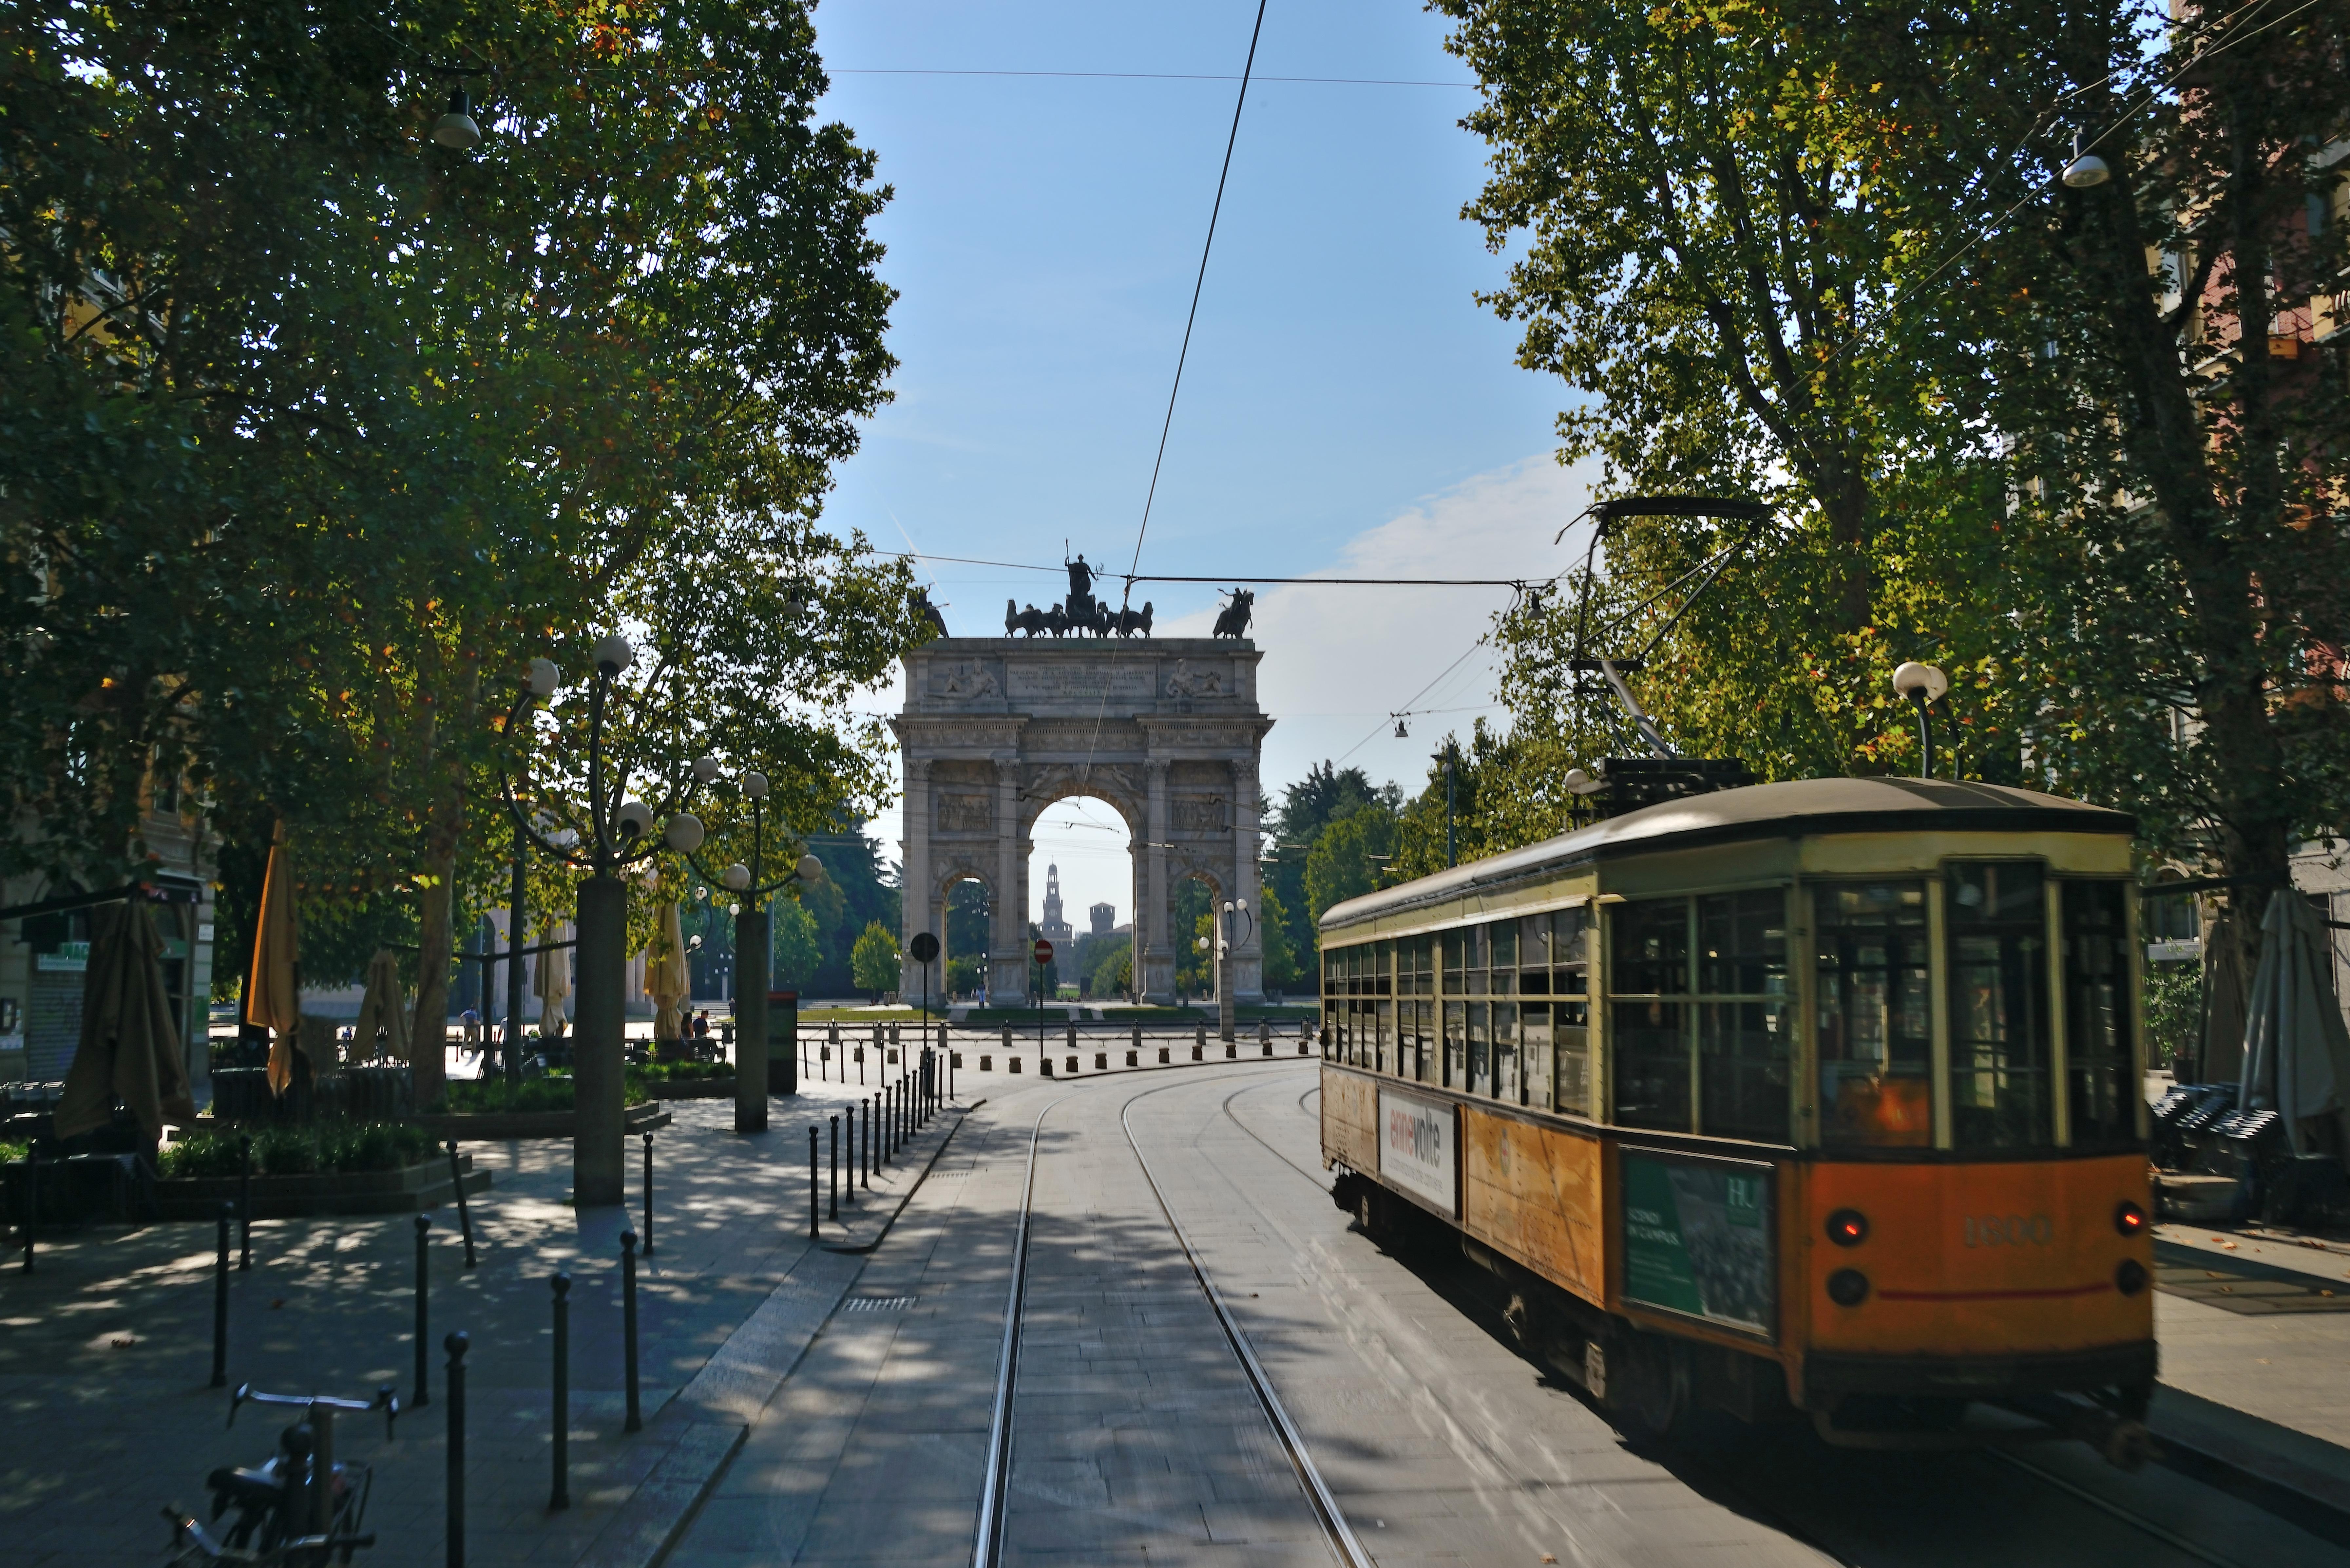 Image courtesy City of Milan